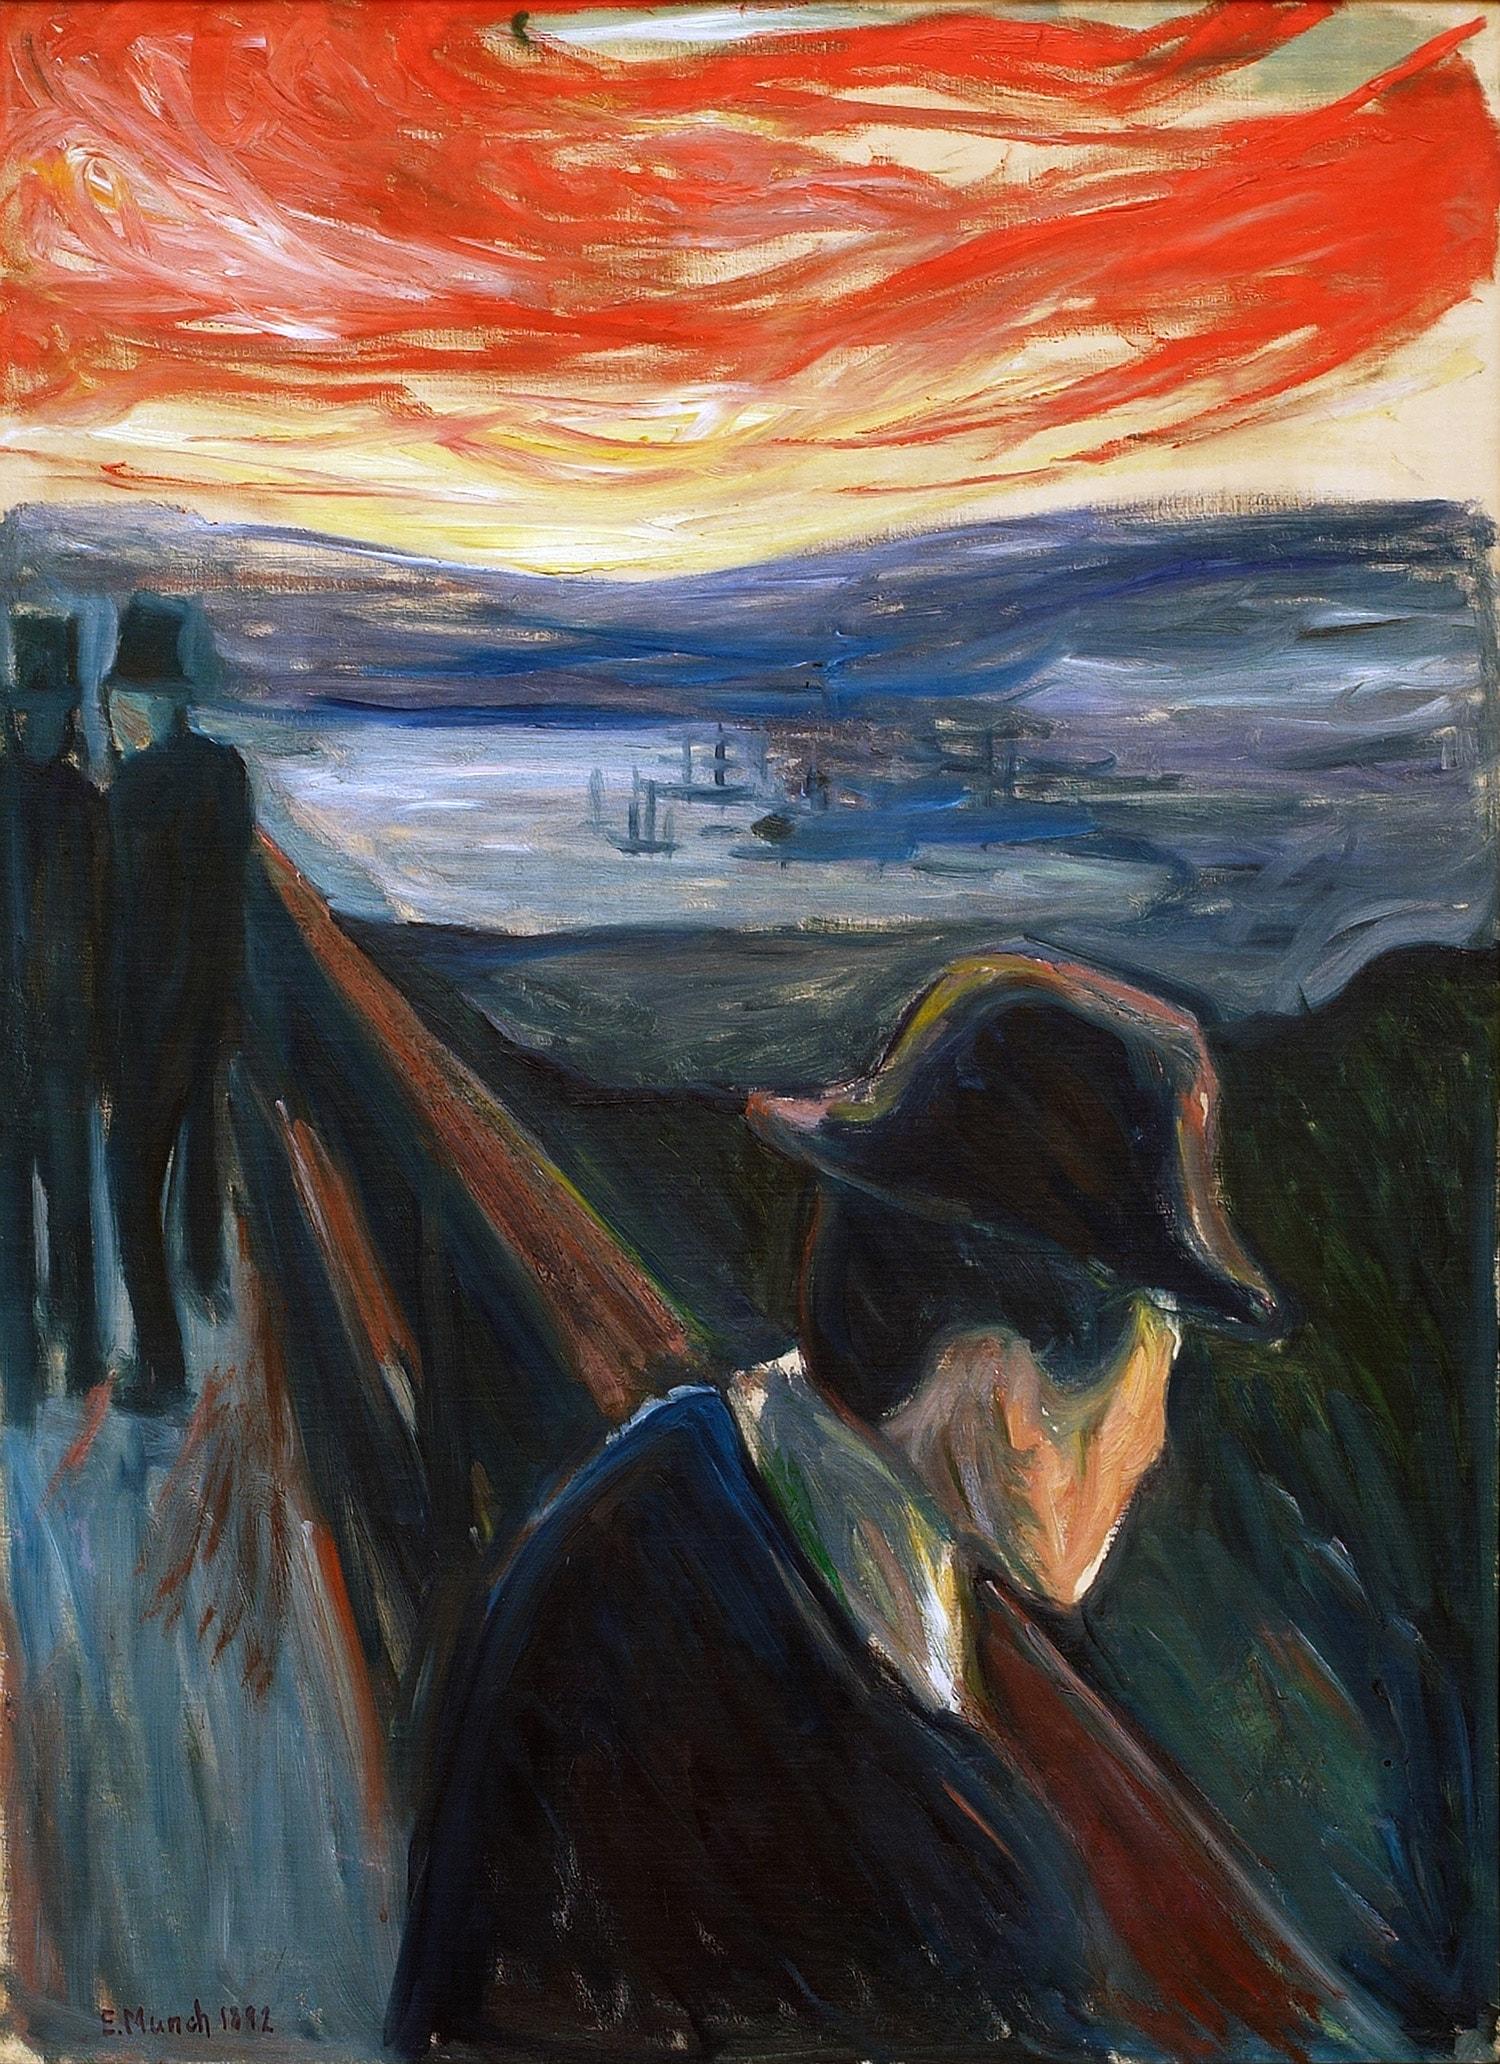 Edvard Munch's 'Sick Mood at Sunset, Despair', 1892 | © 2017 Artists Rights Society (ARS), New York / Thielska Galleriet, Sweden / Tord Lund